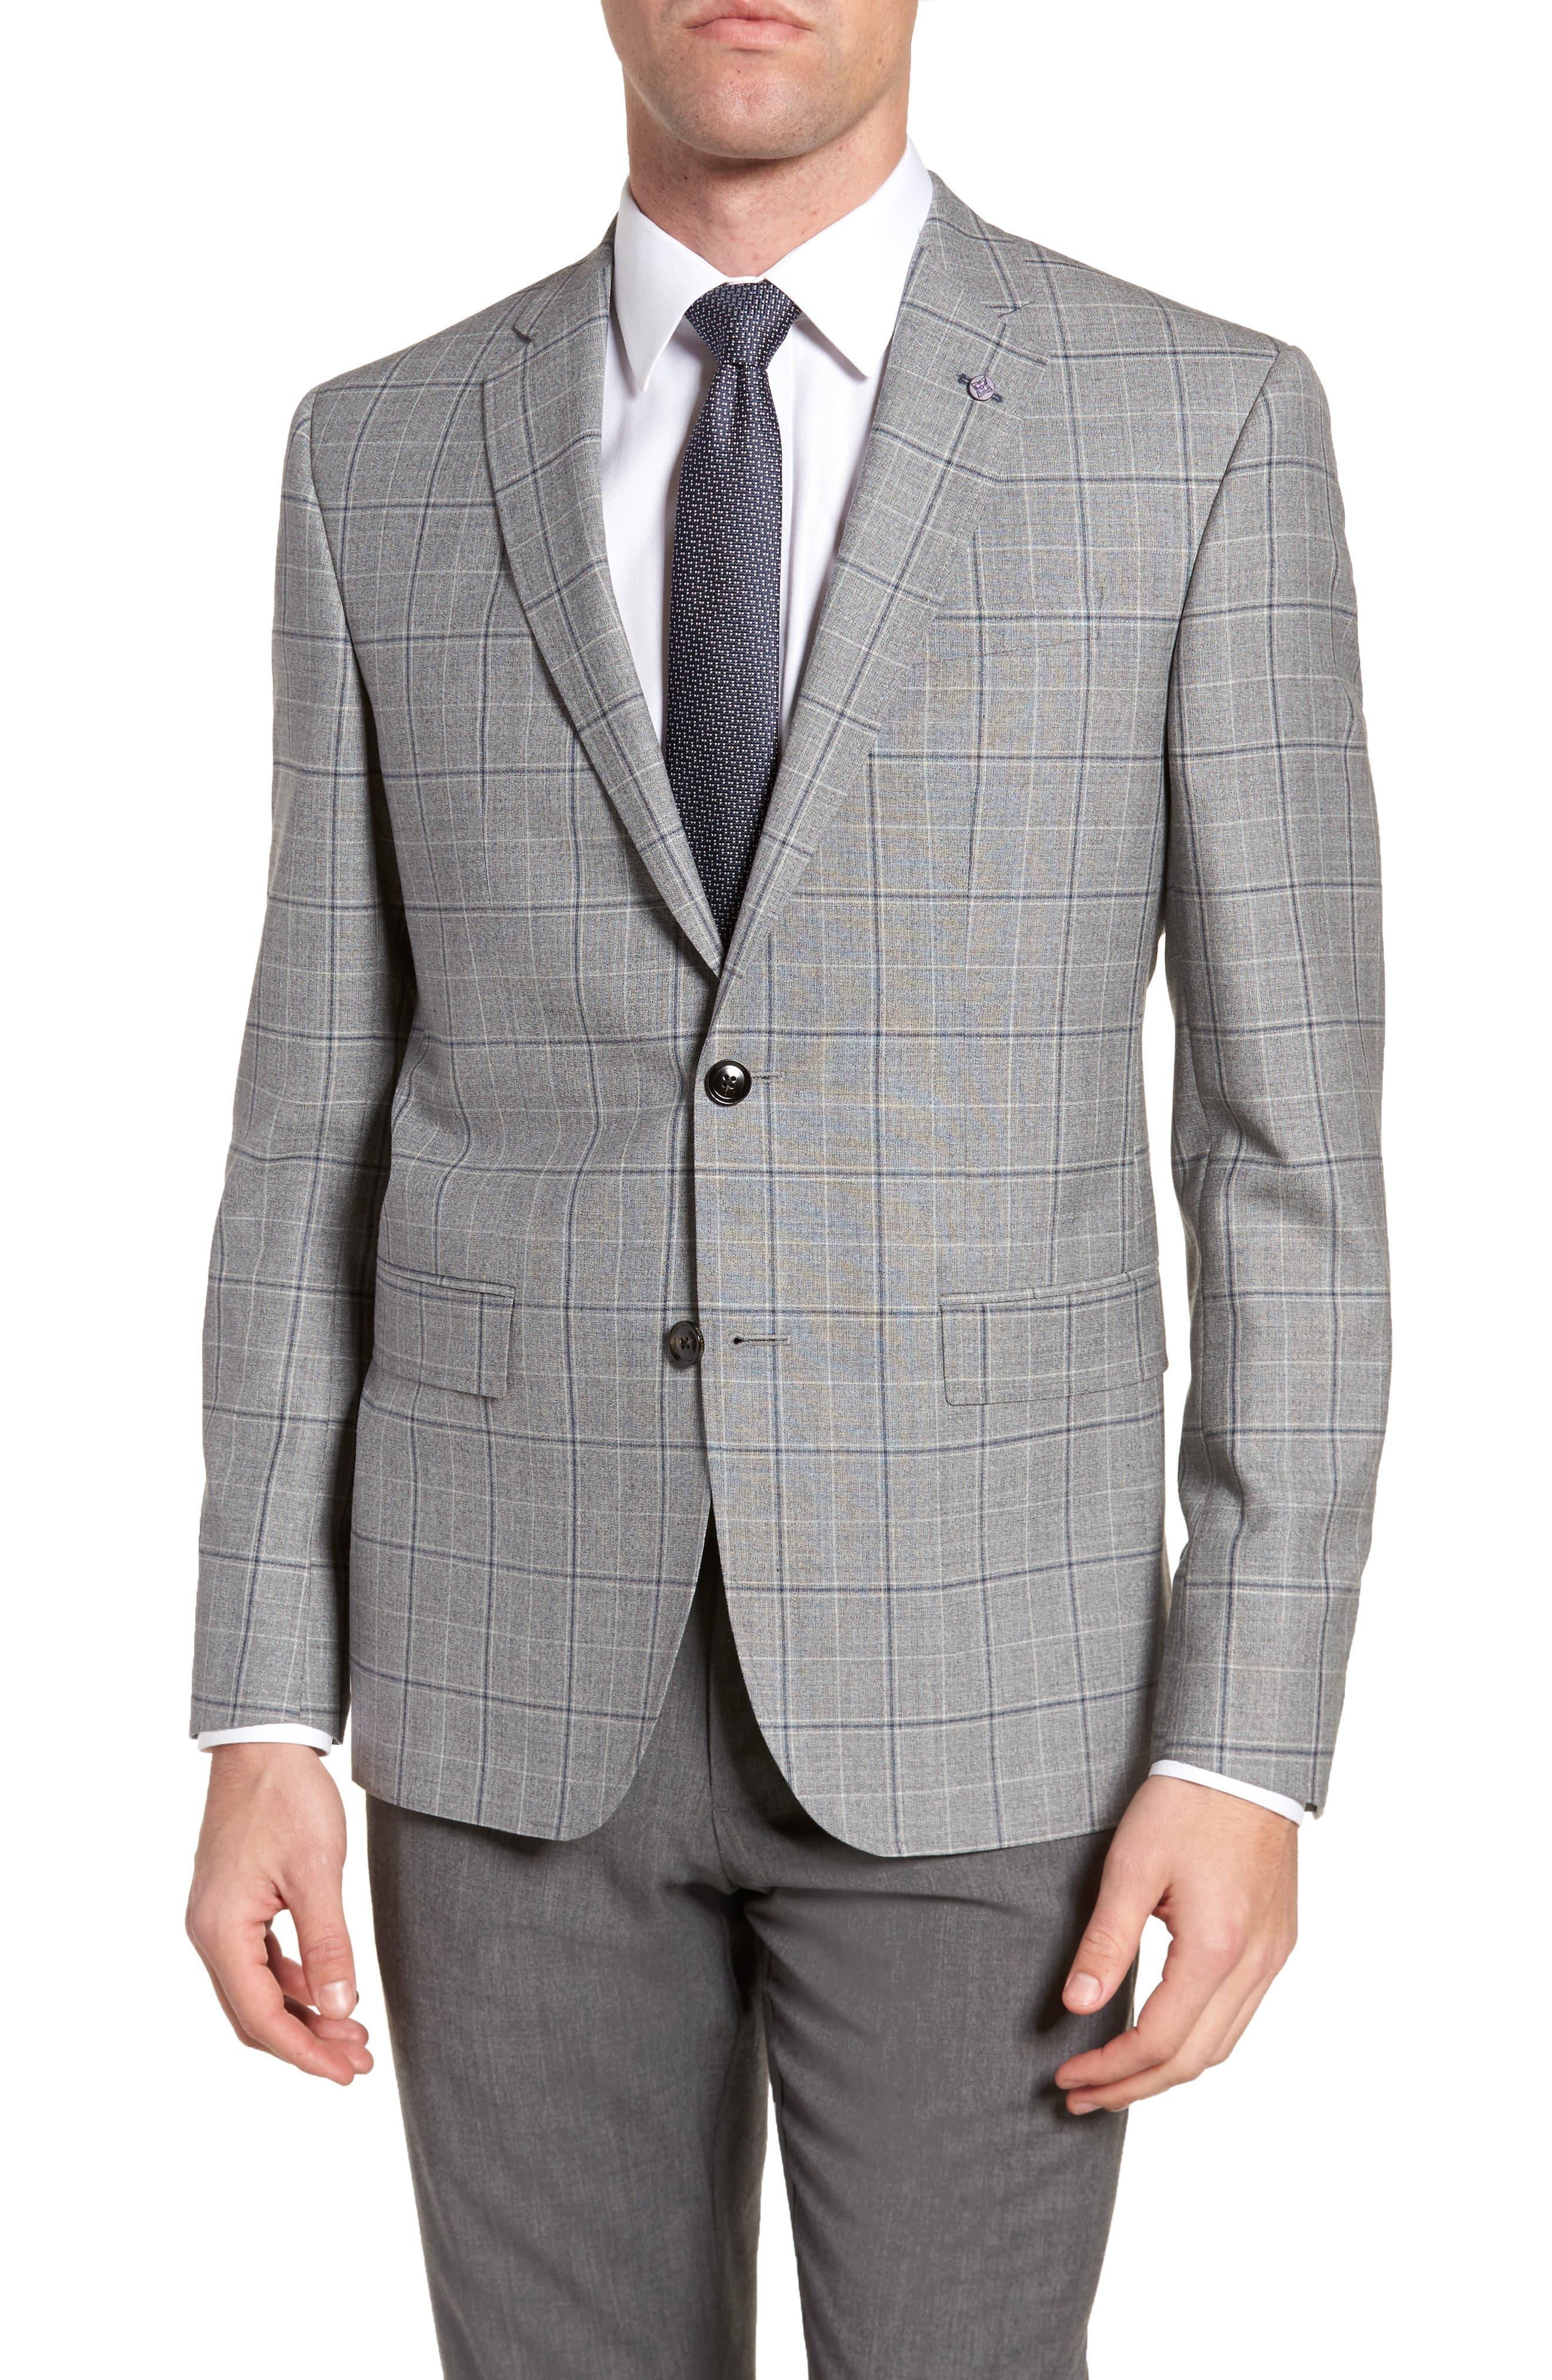 Jay Trim Fit Plaid Wool Sport Coat,                         Main,                         color, Light Grey